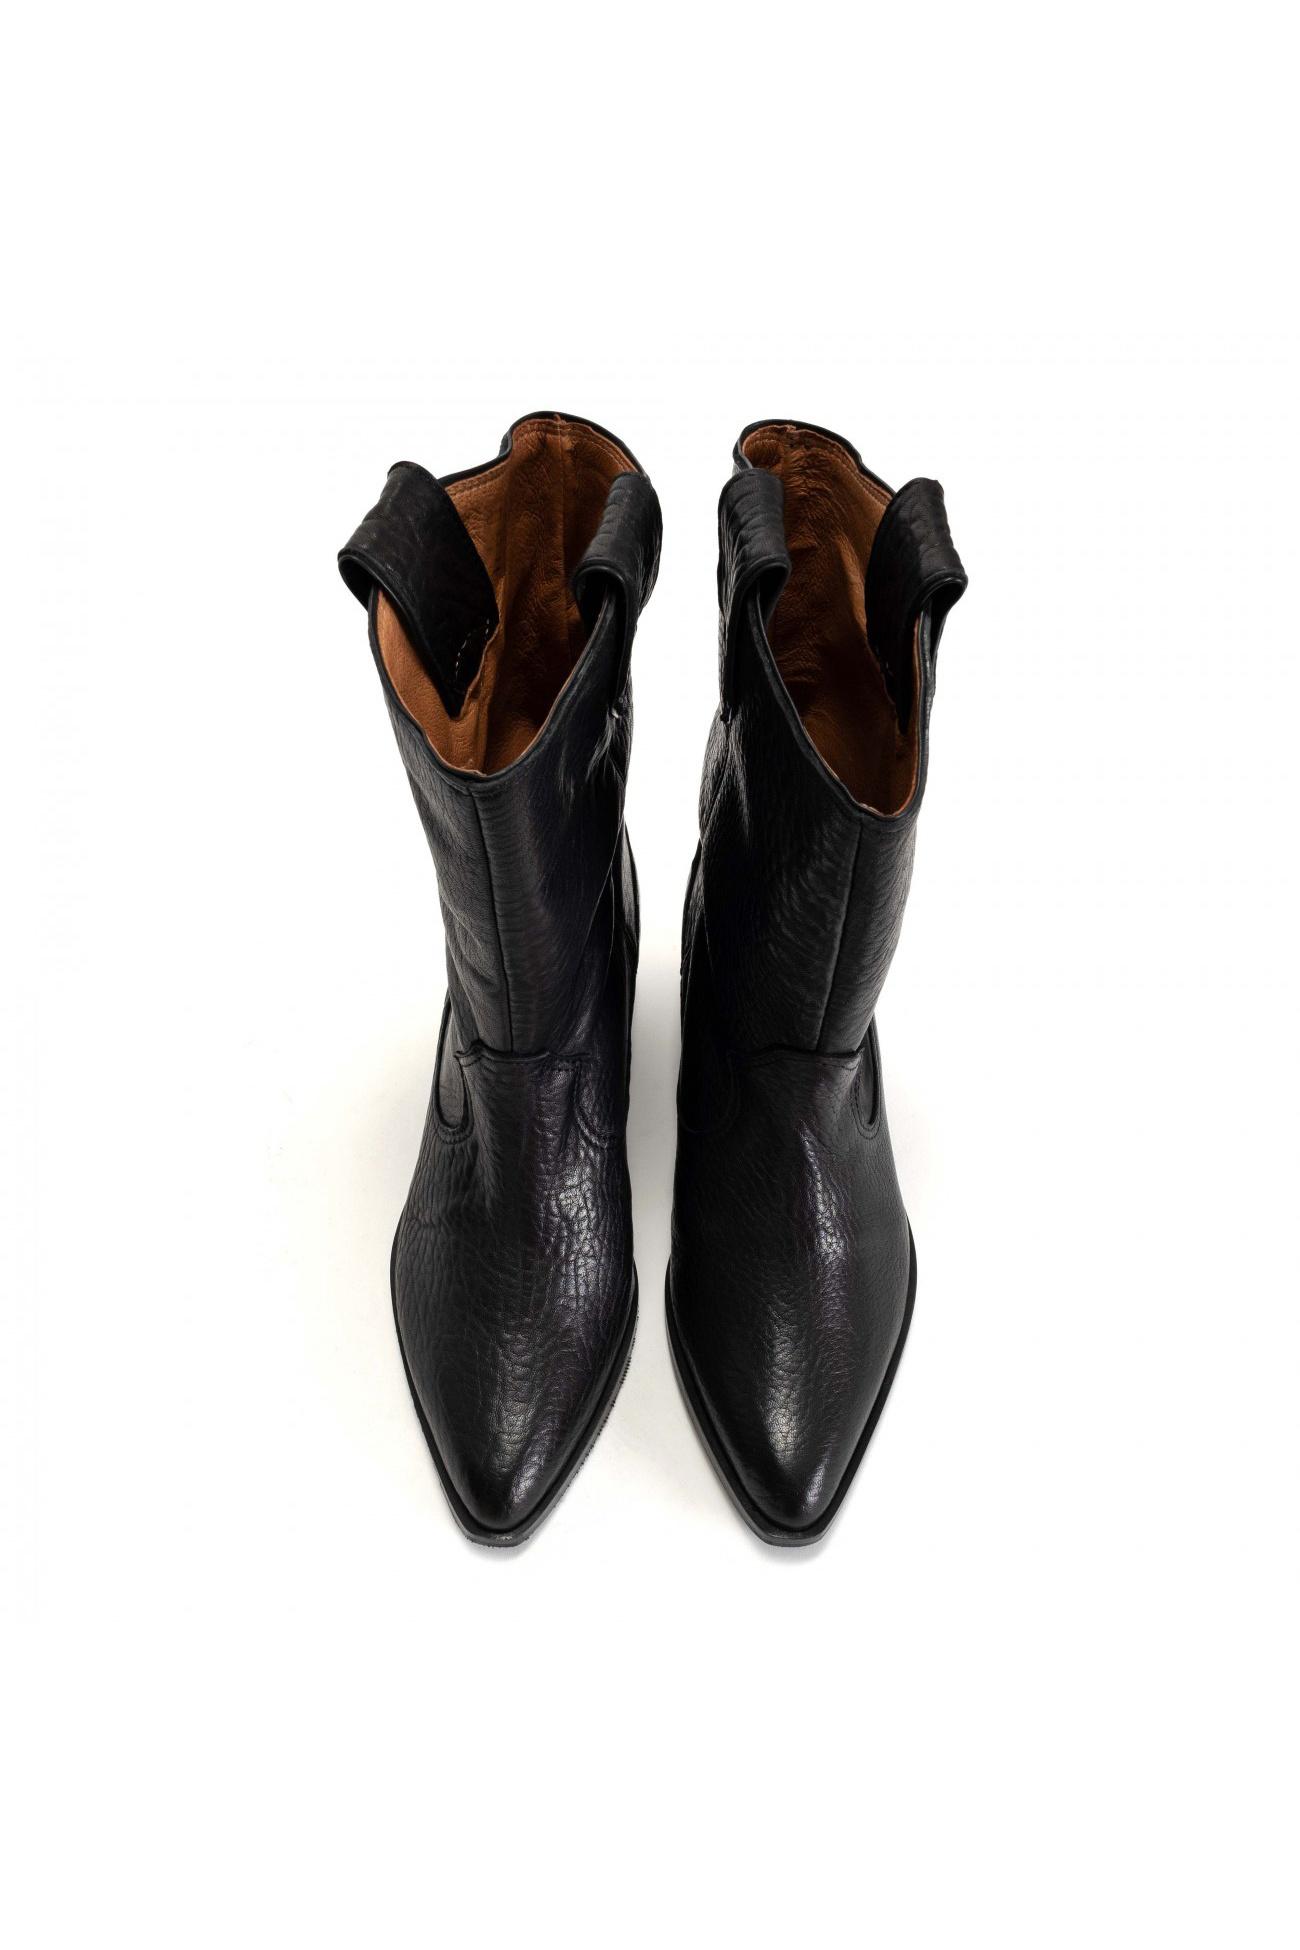 Saseline 35 Heavy Grain Calf Boot - Black-5